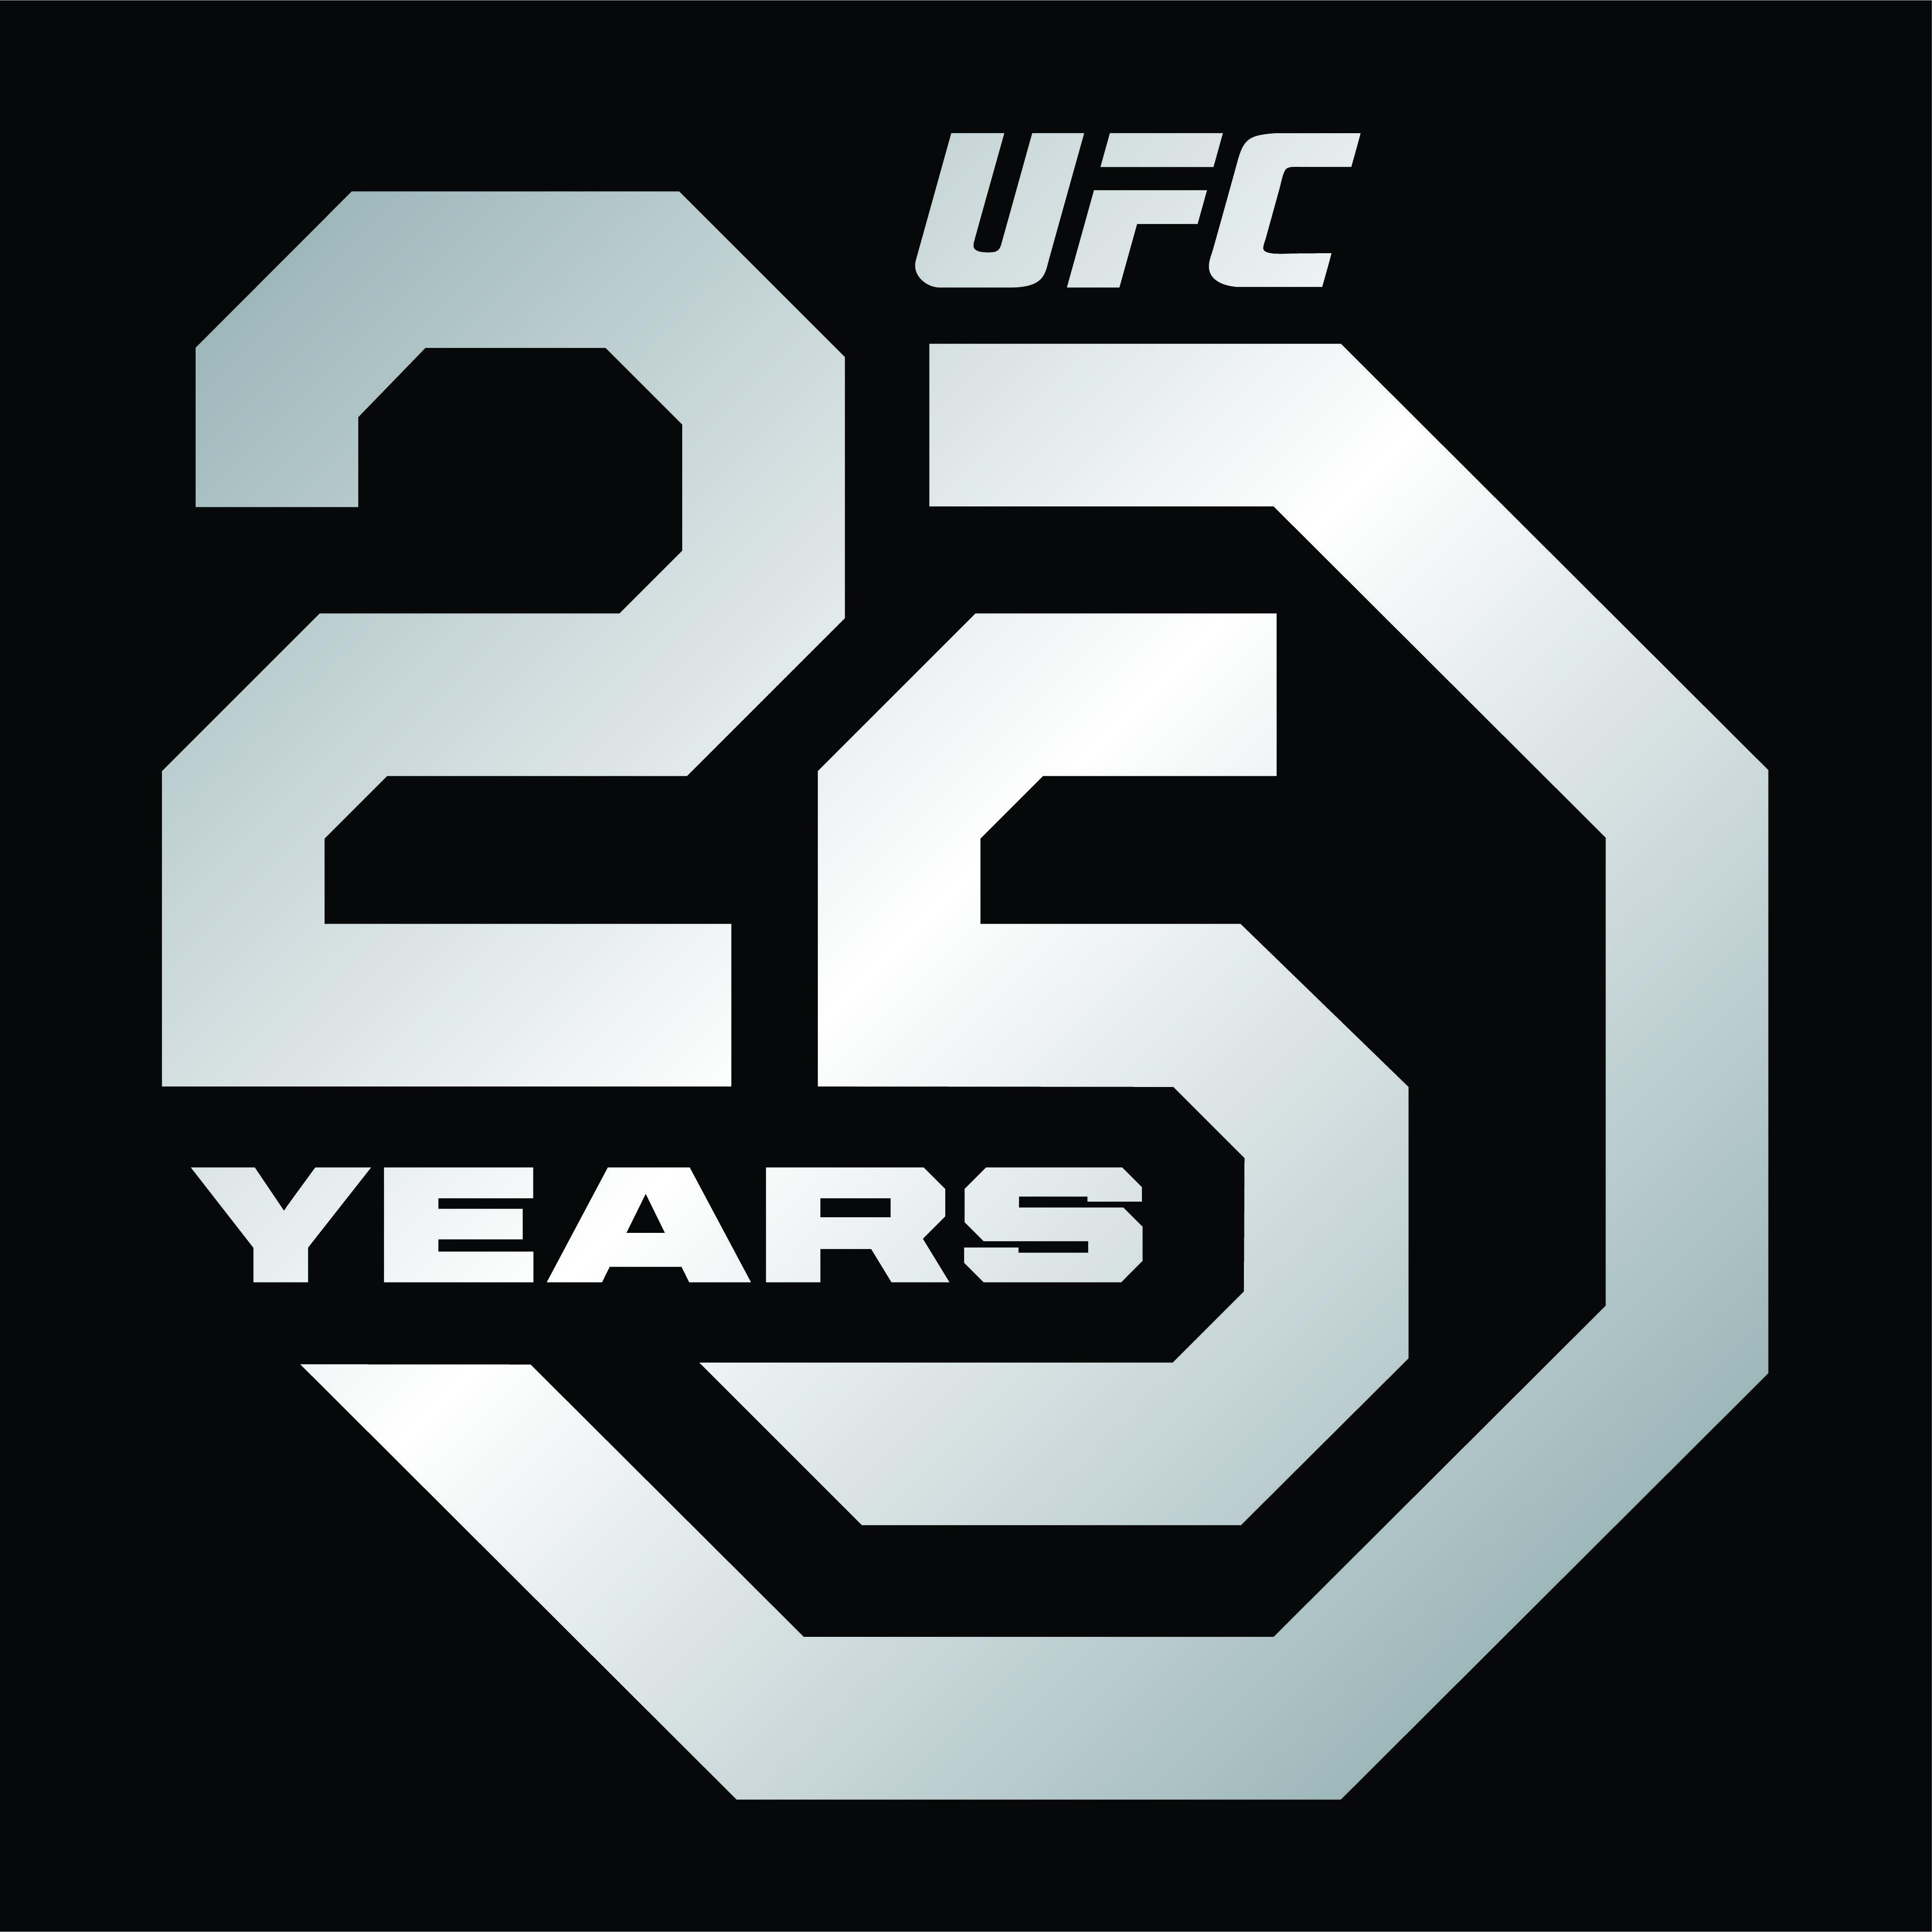 Ufc Unveils 25th Anniversary Logos Anniversary Logo Ufc Logos